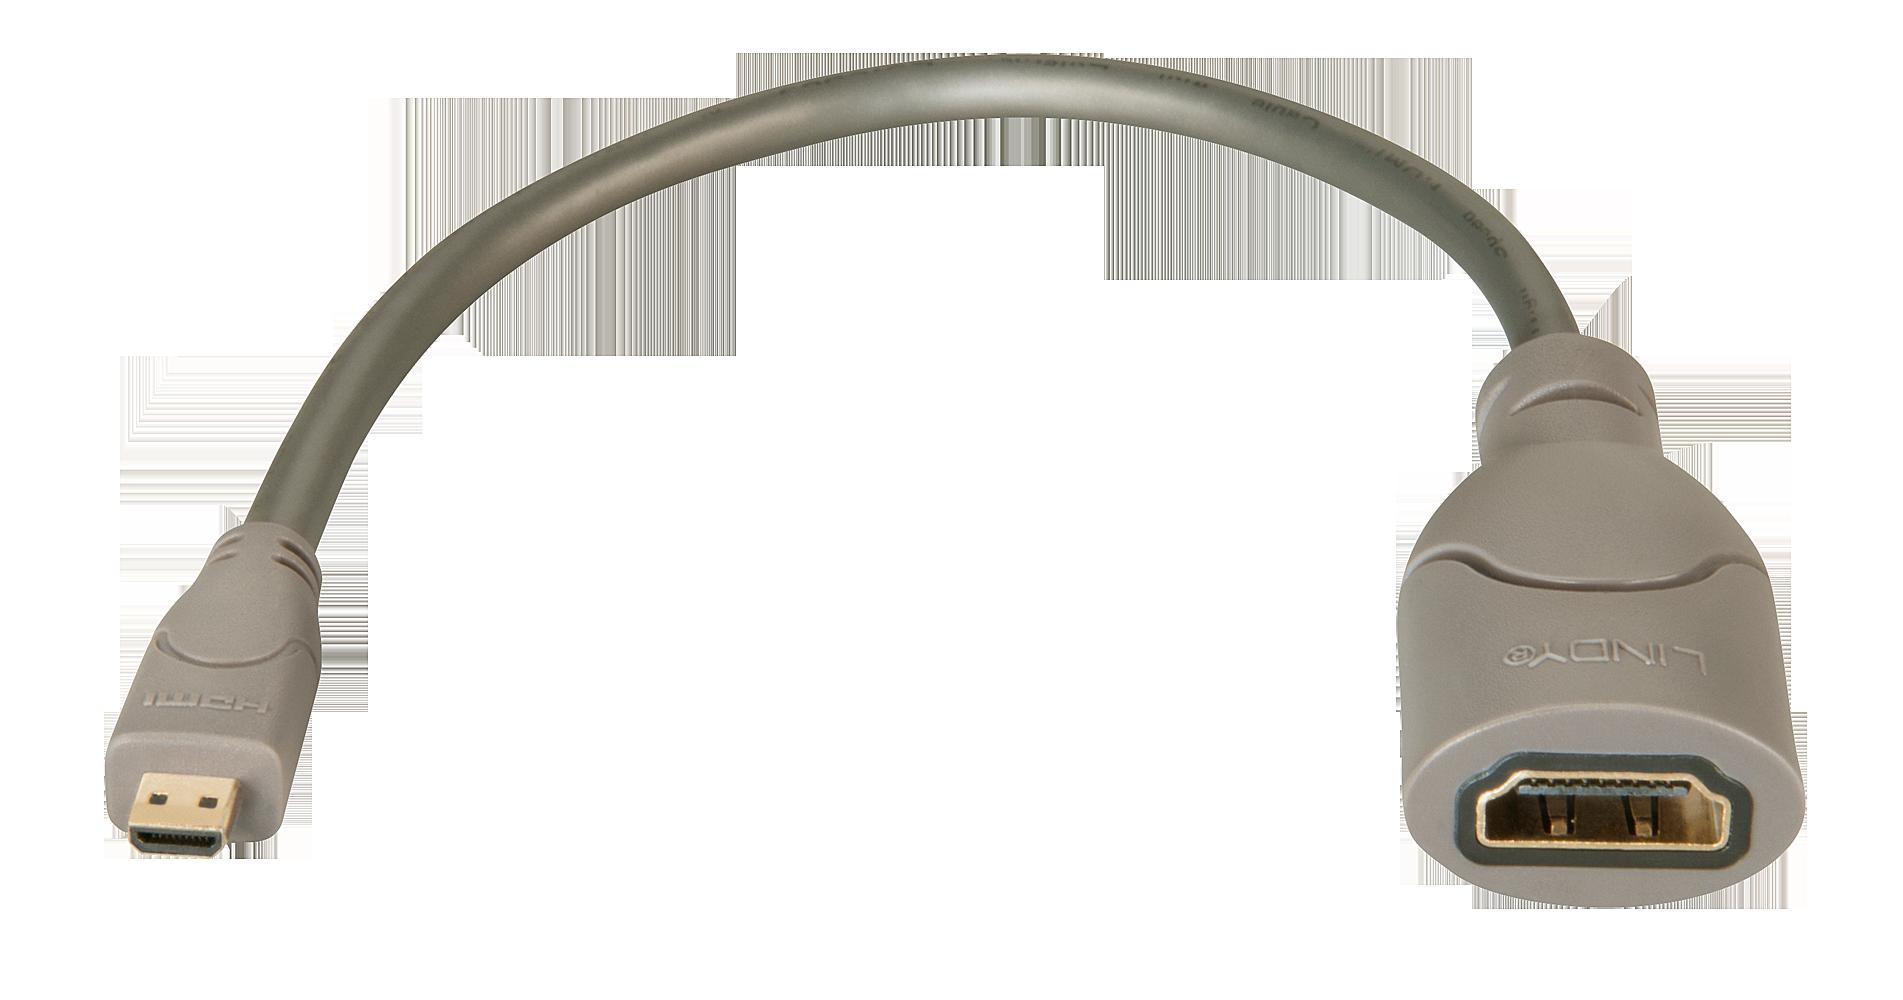 Adapterkabel HDMI (Kupp.) an HDMI Micro (St.), ca. 0,15m